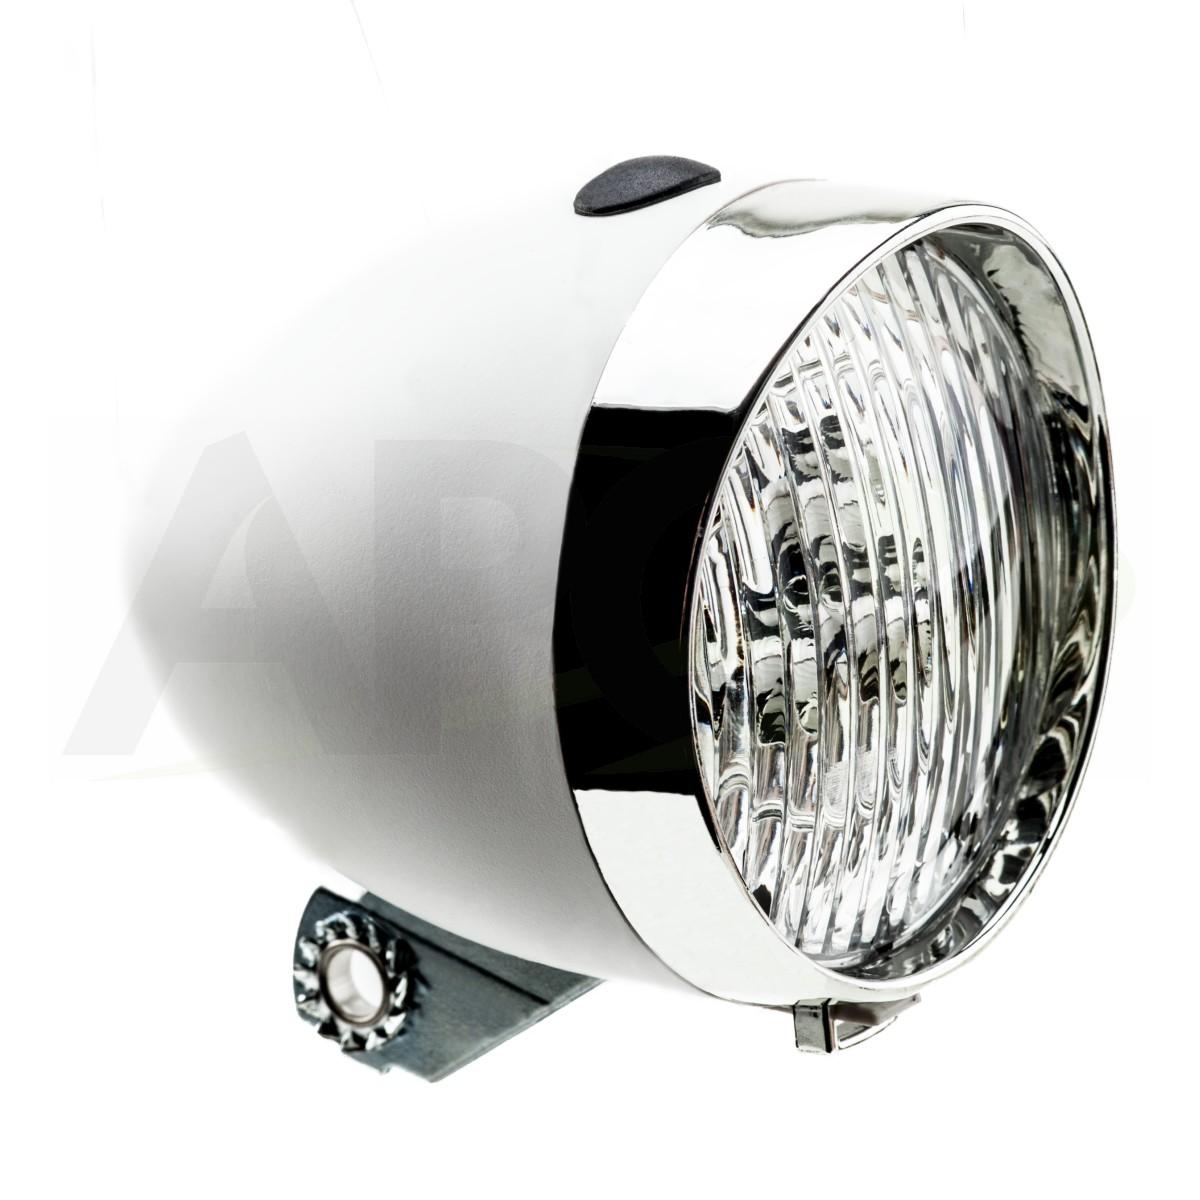 LAMPA BATERYJNA PRZÓD HW 160302 biała